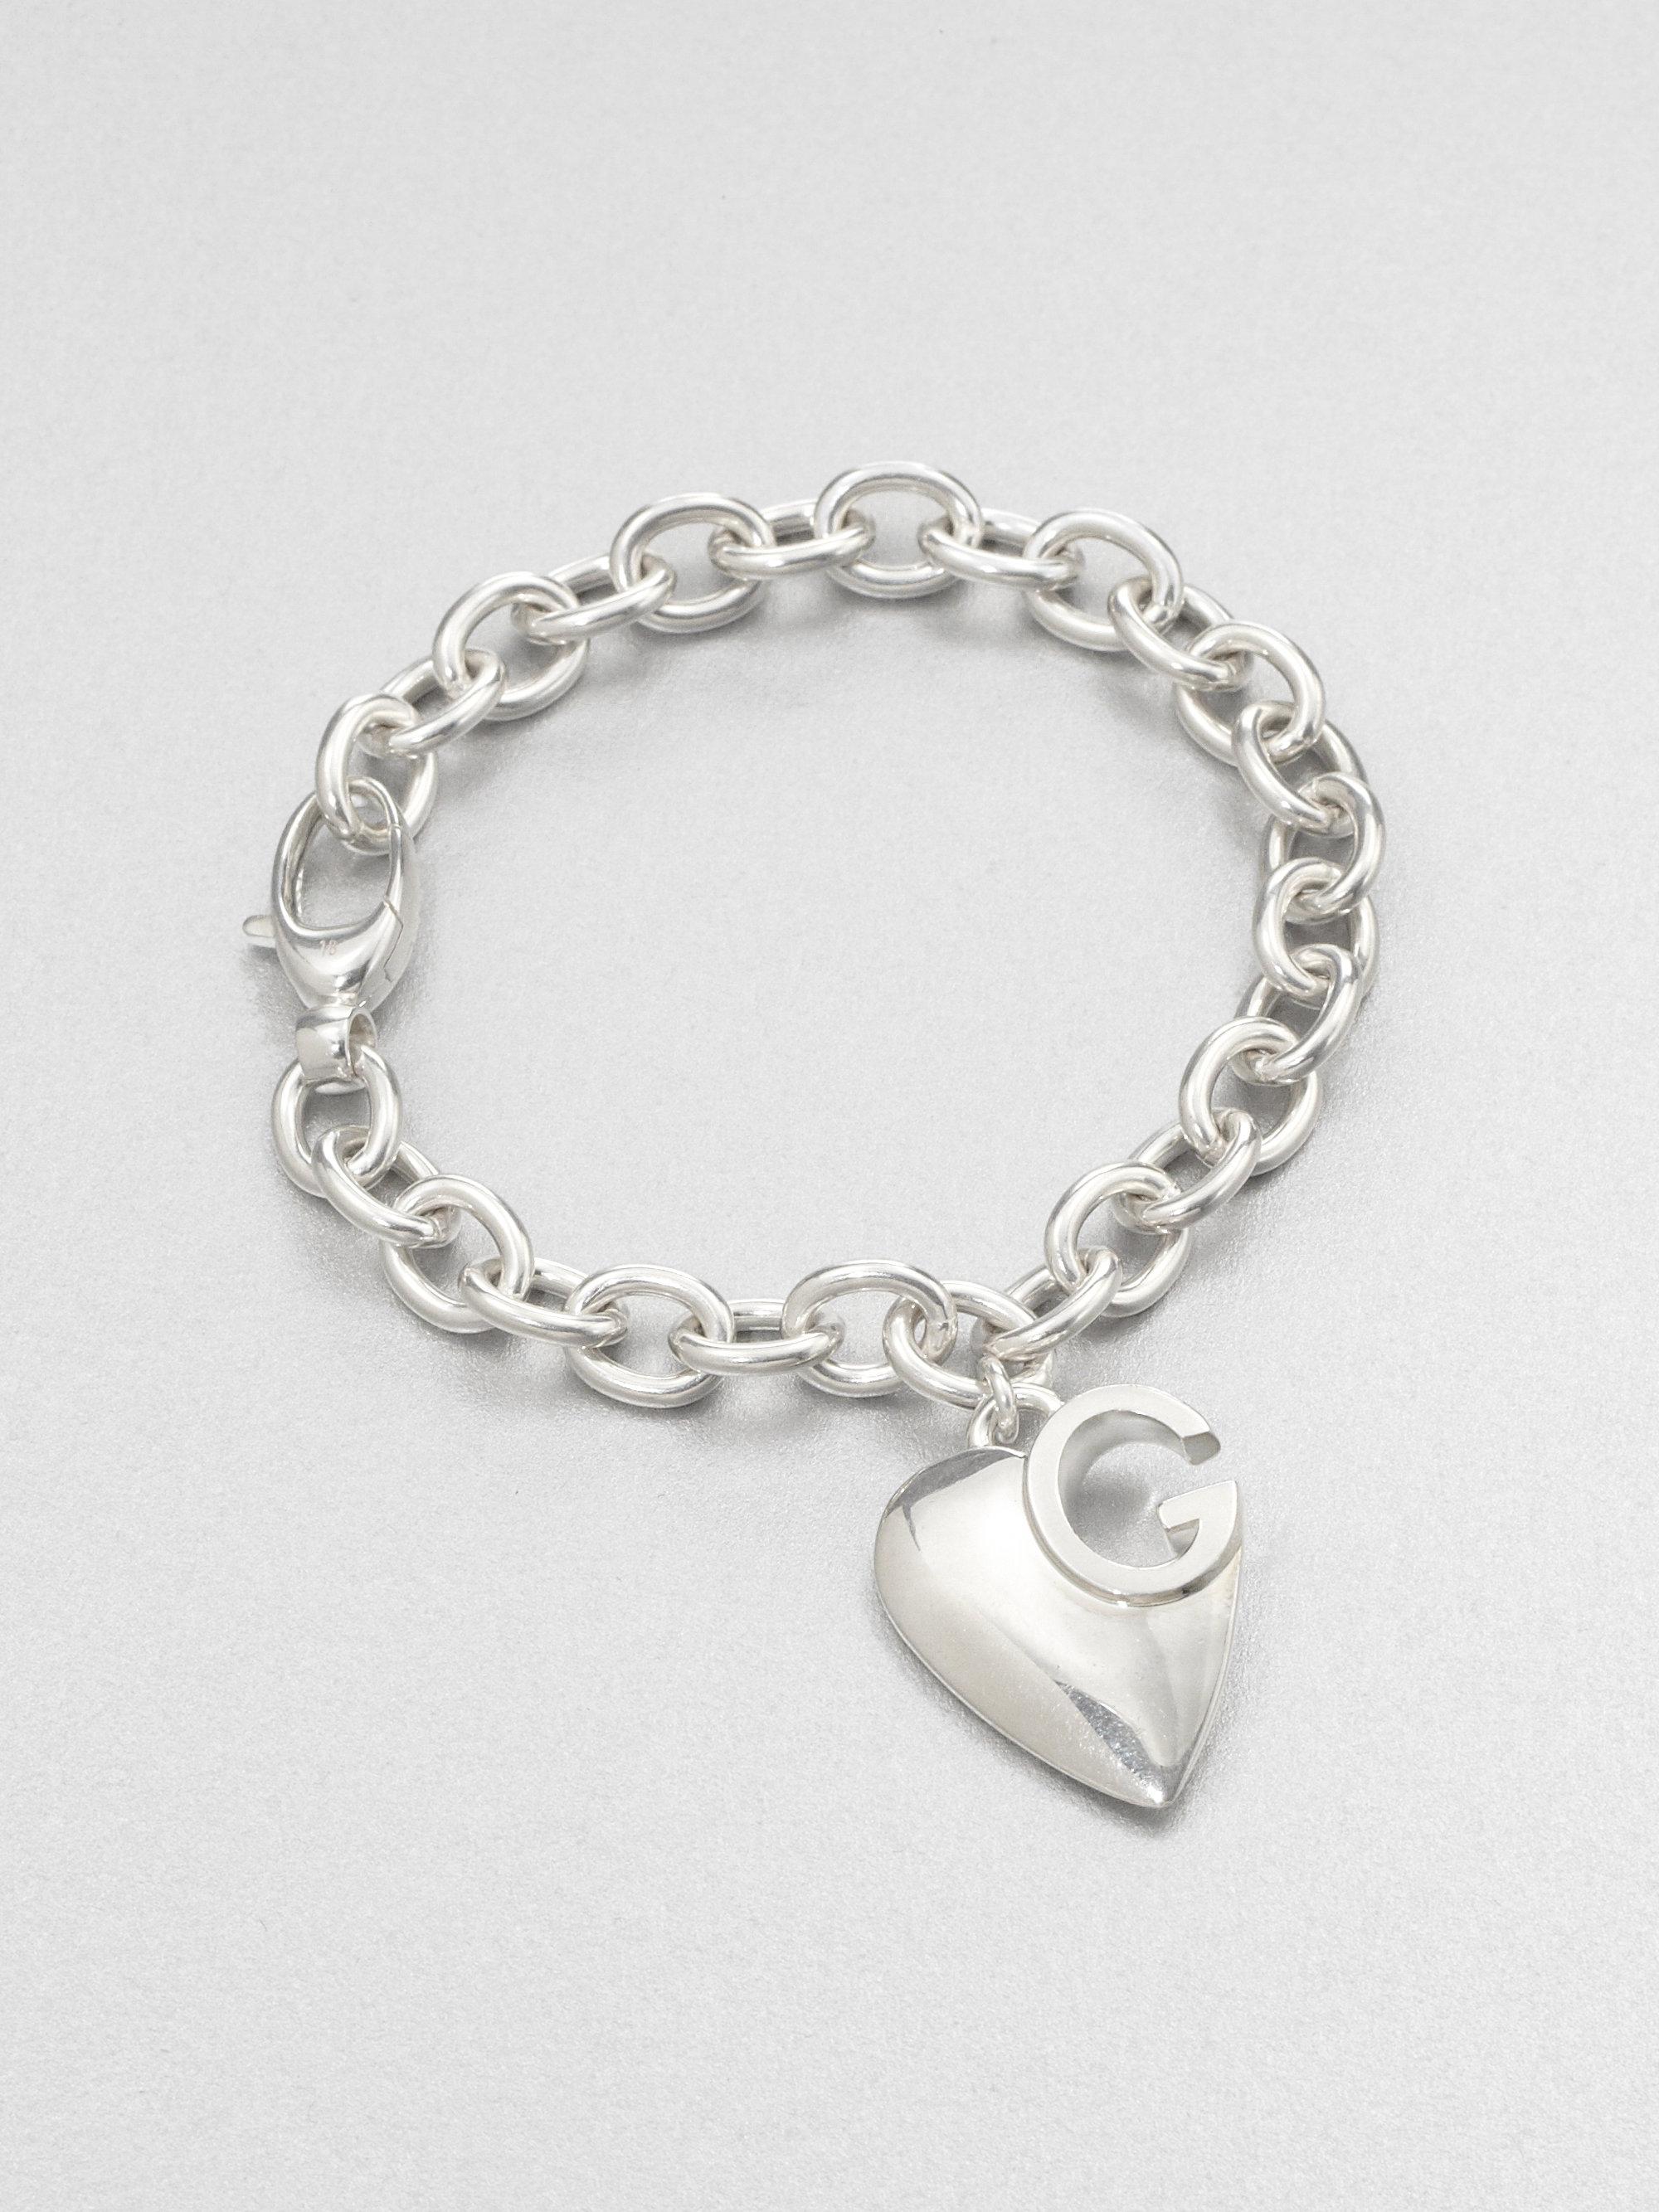 lyst gucci sterling silver heart charm bracelet in metallic. Black Bedroom Furniture Sets. Home Design Ideas